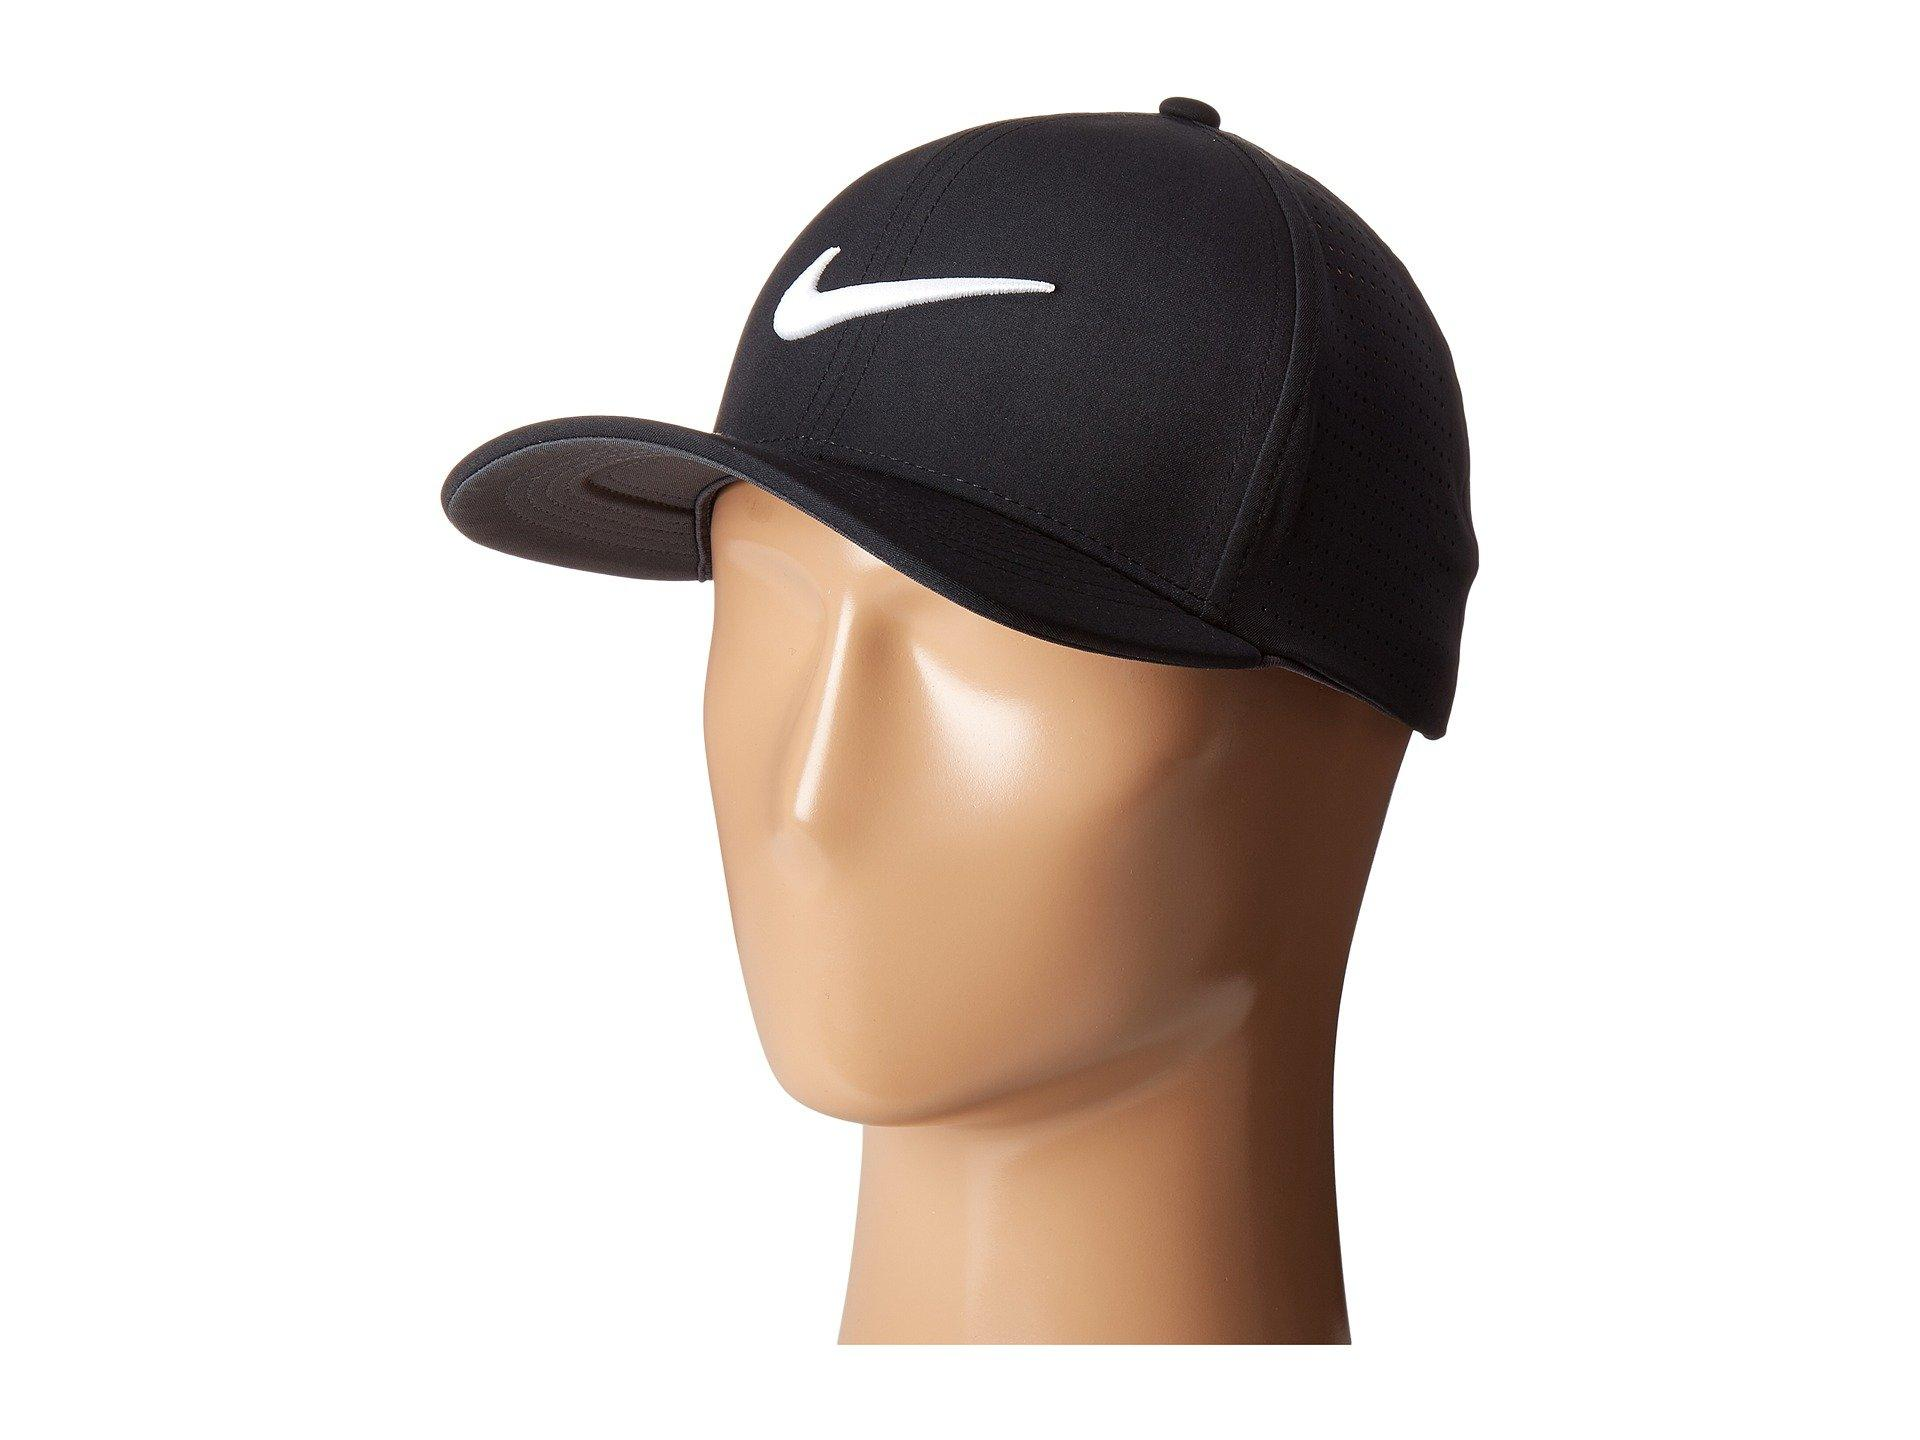 Nike Classic99 Perf Cap In Black/Anthracite/White